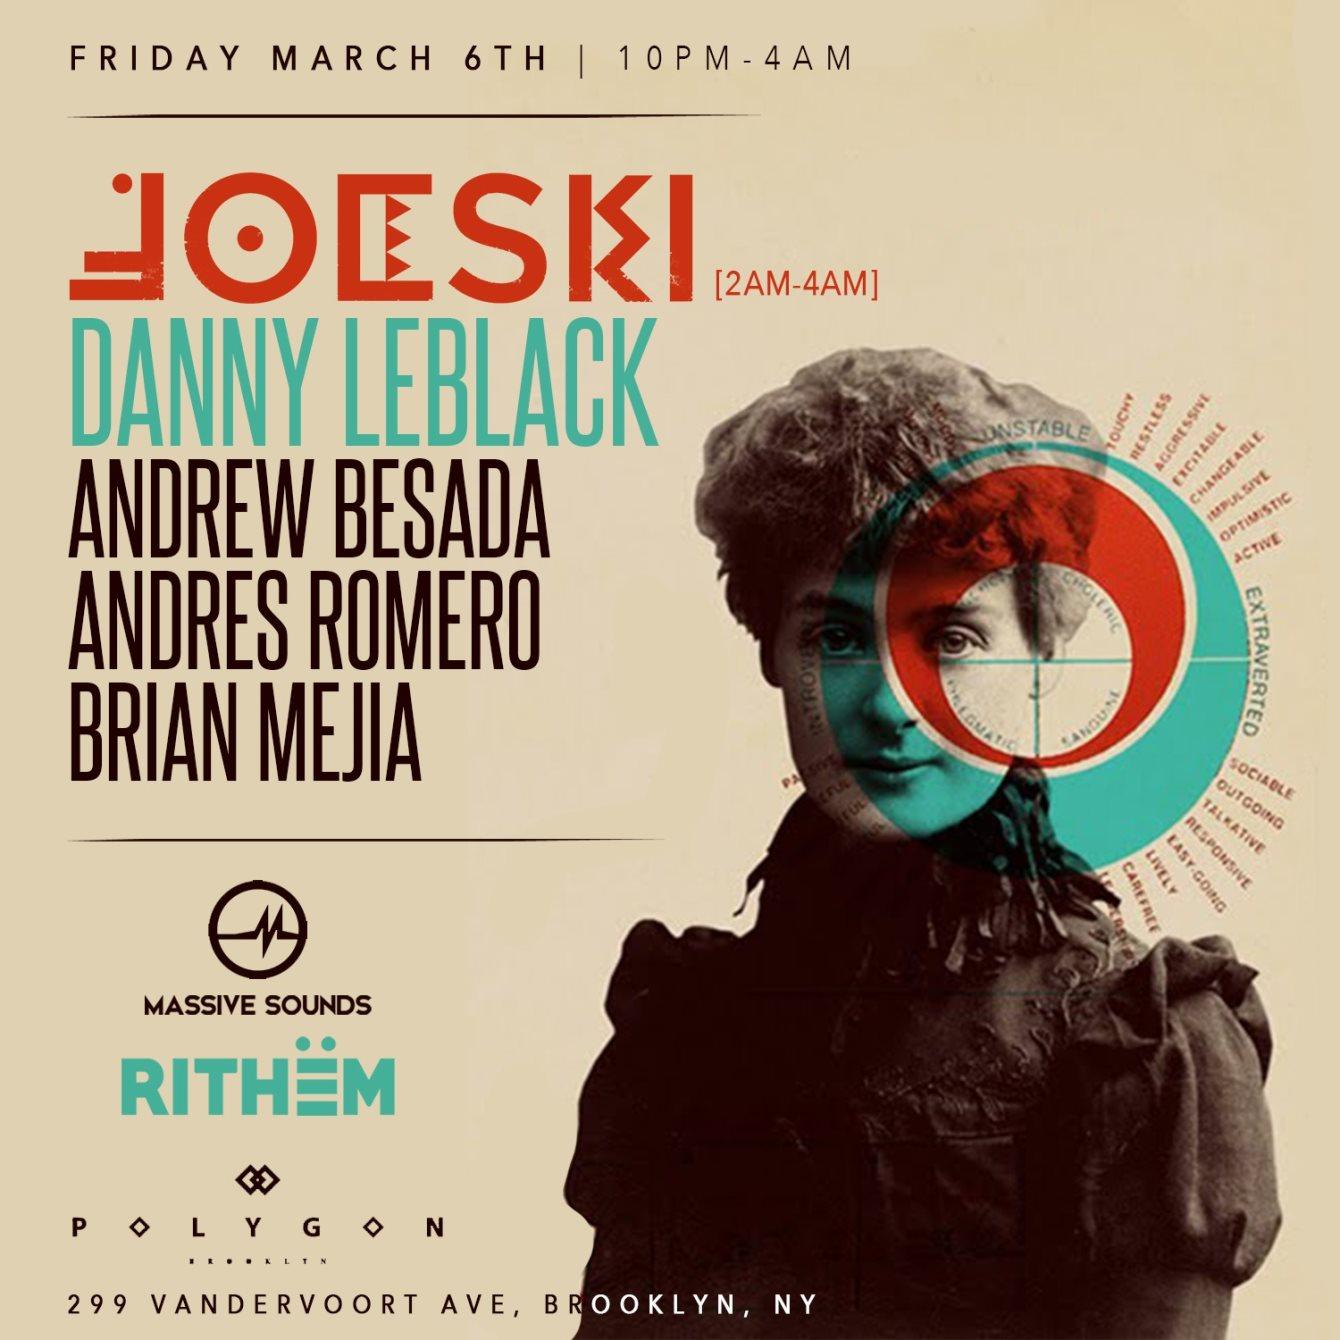 Rithëm and Massive Sounds presents Joeski - Flyer front